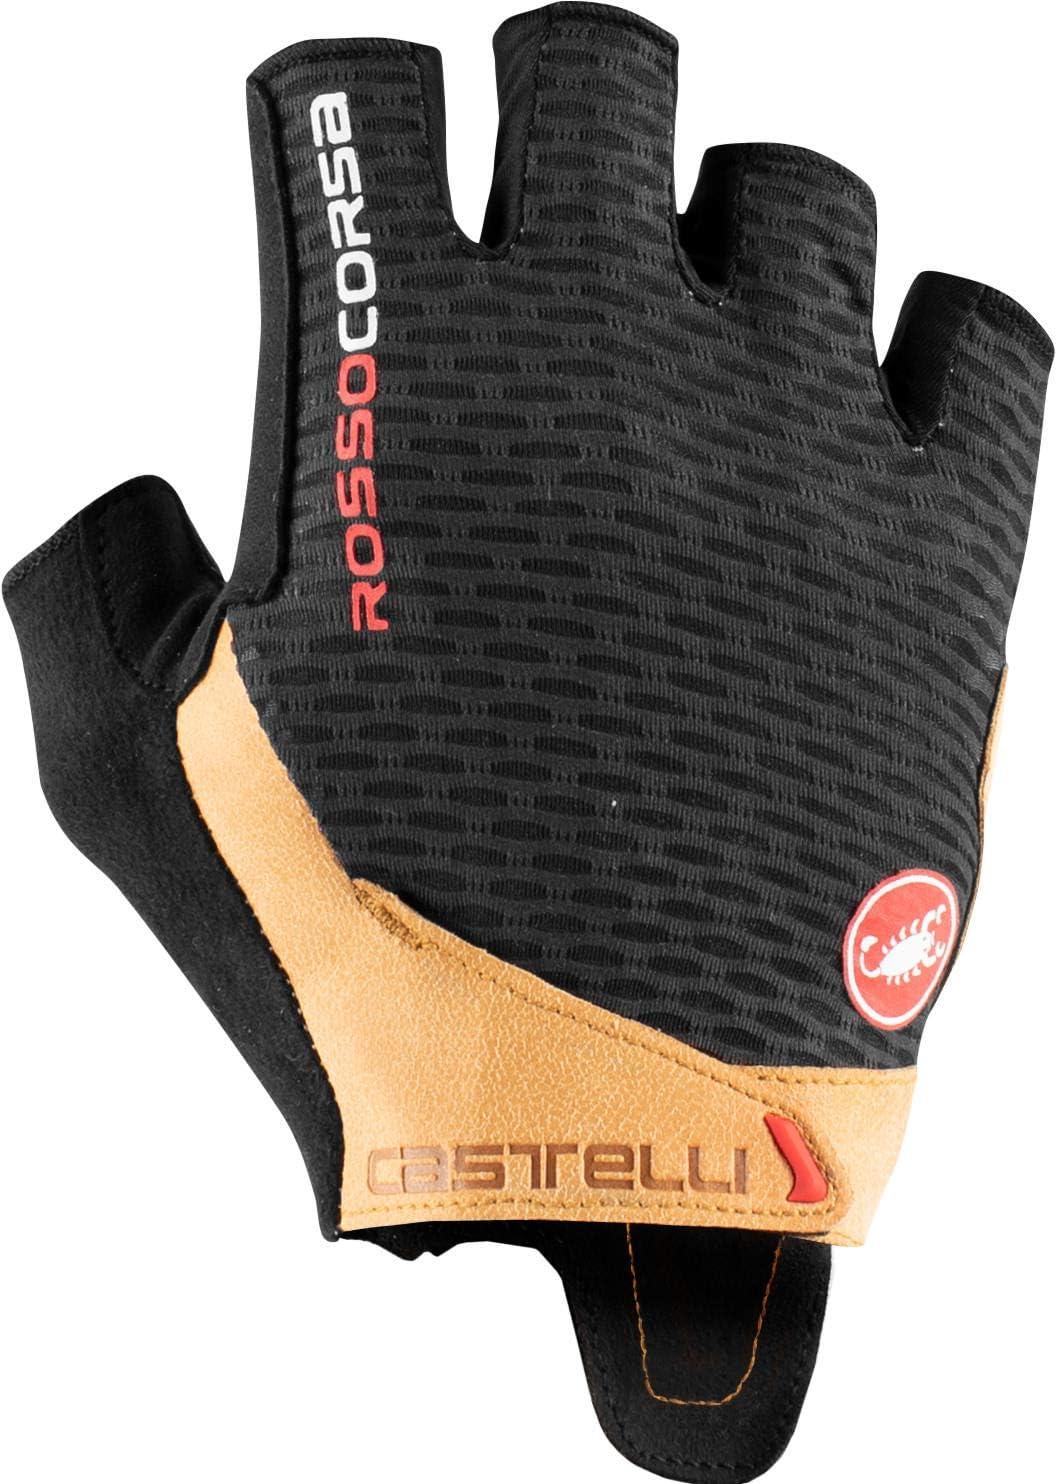 castelli Rosso Corsa Pro V Glove Guantes de Ciclismo, Hombre